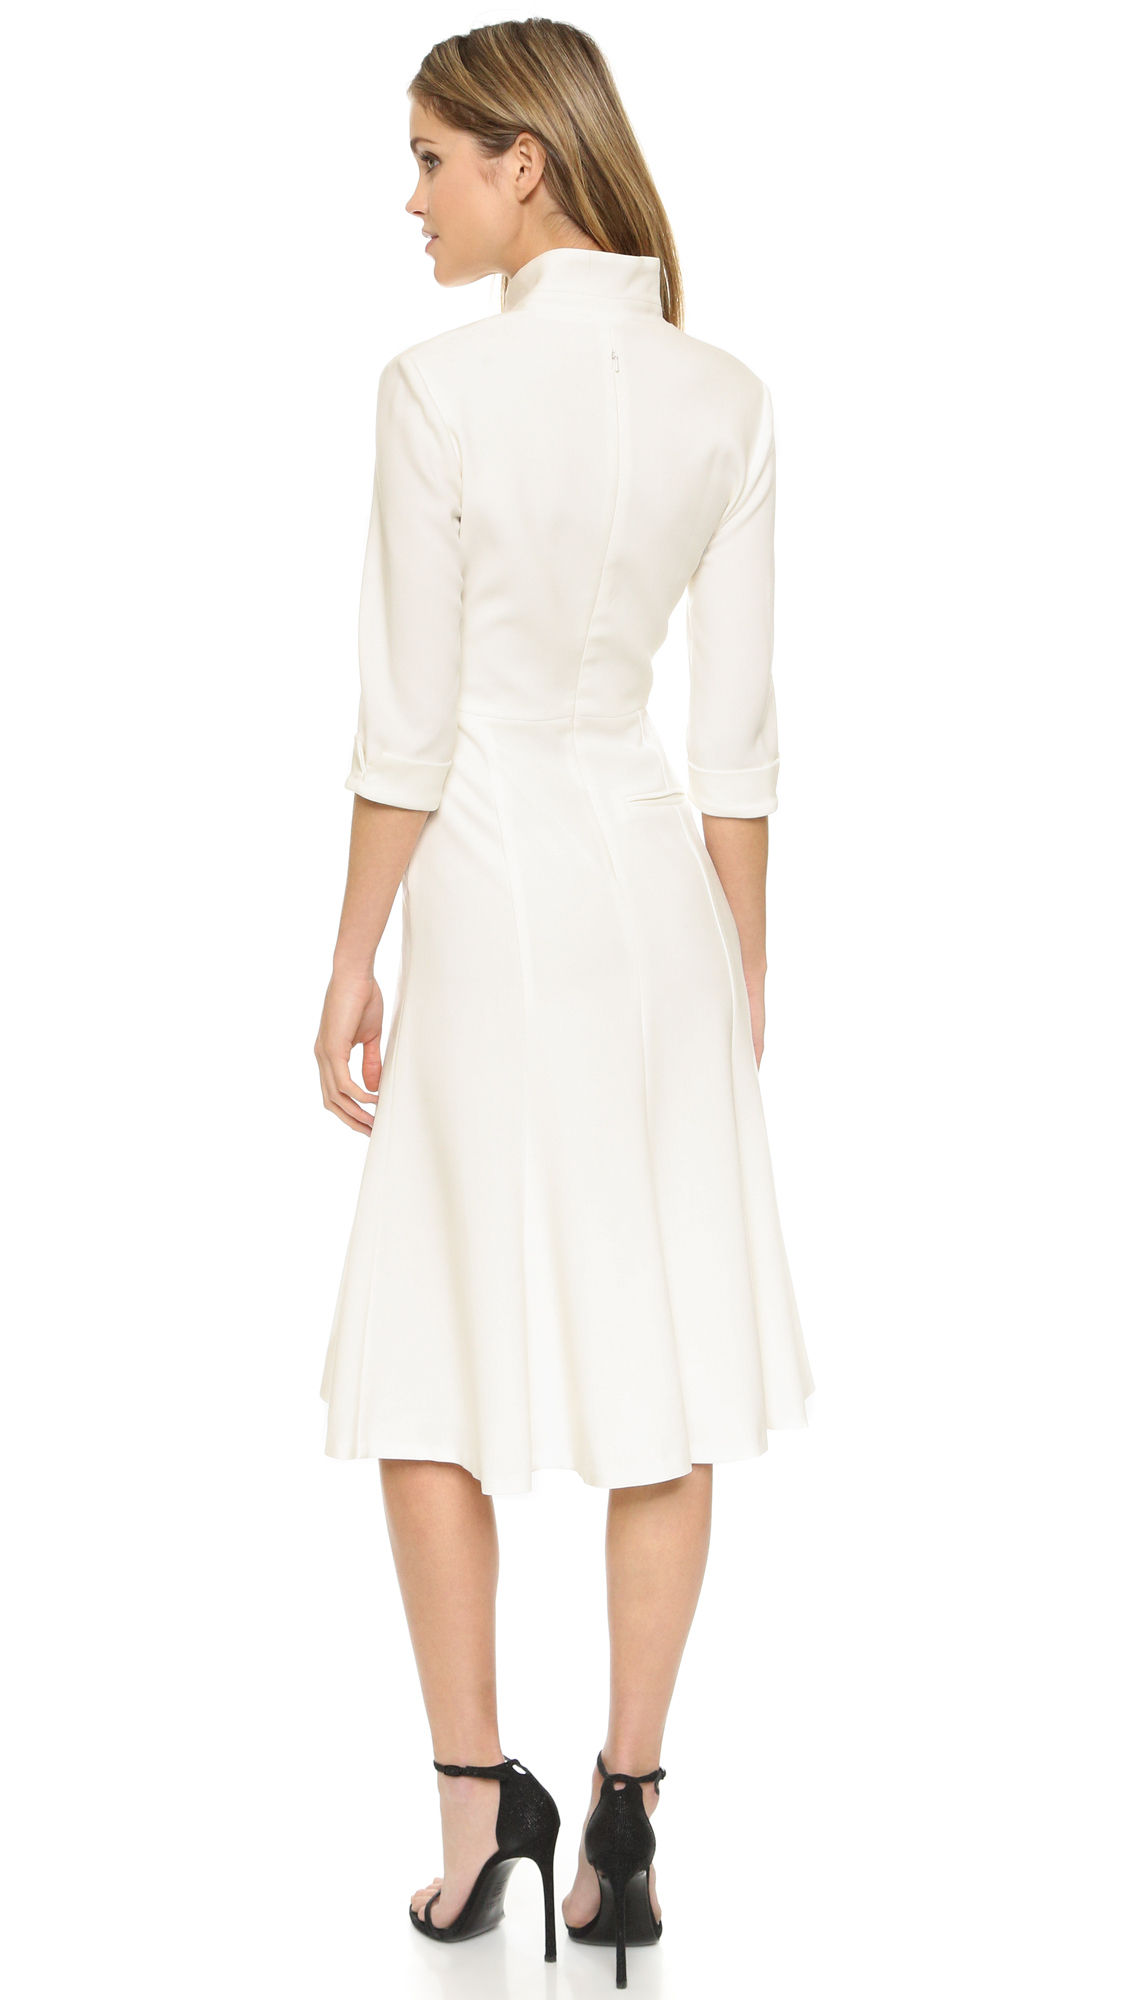 Lyst Black Halo Kensington Dress In White